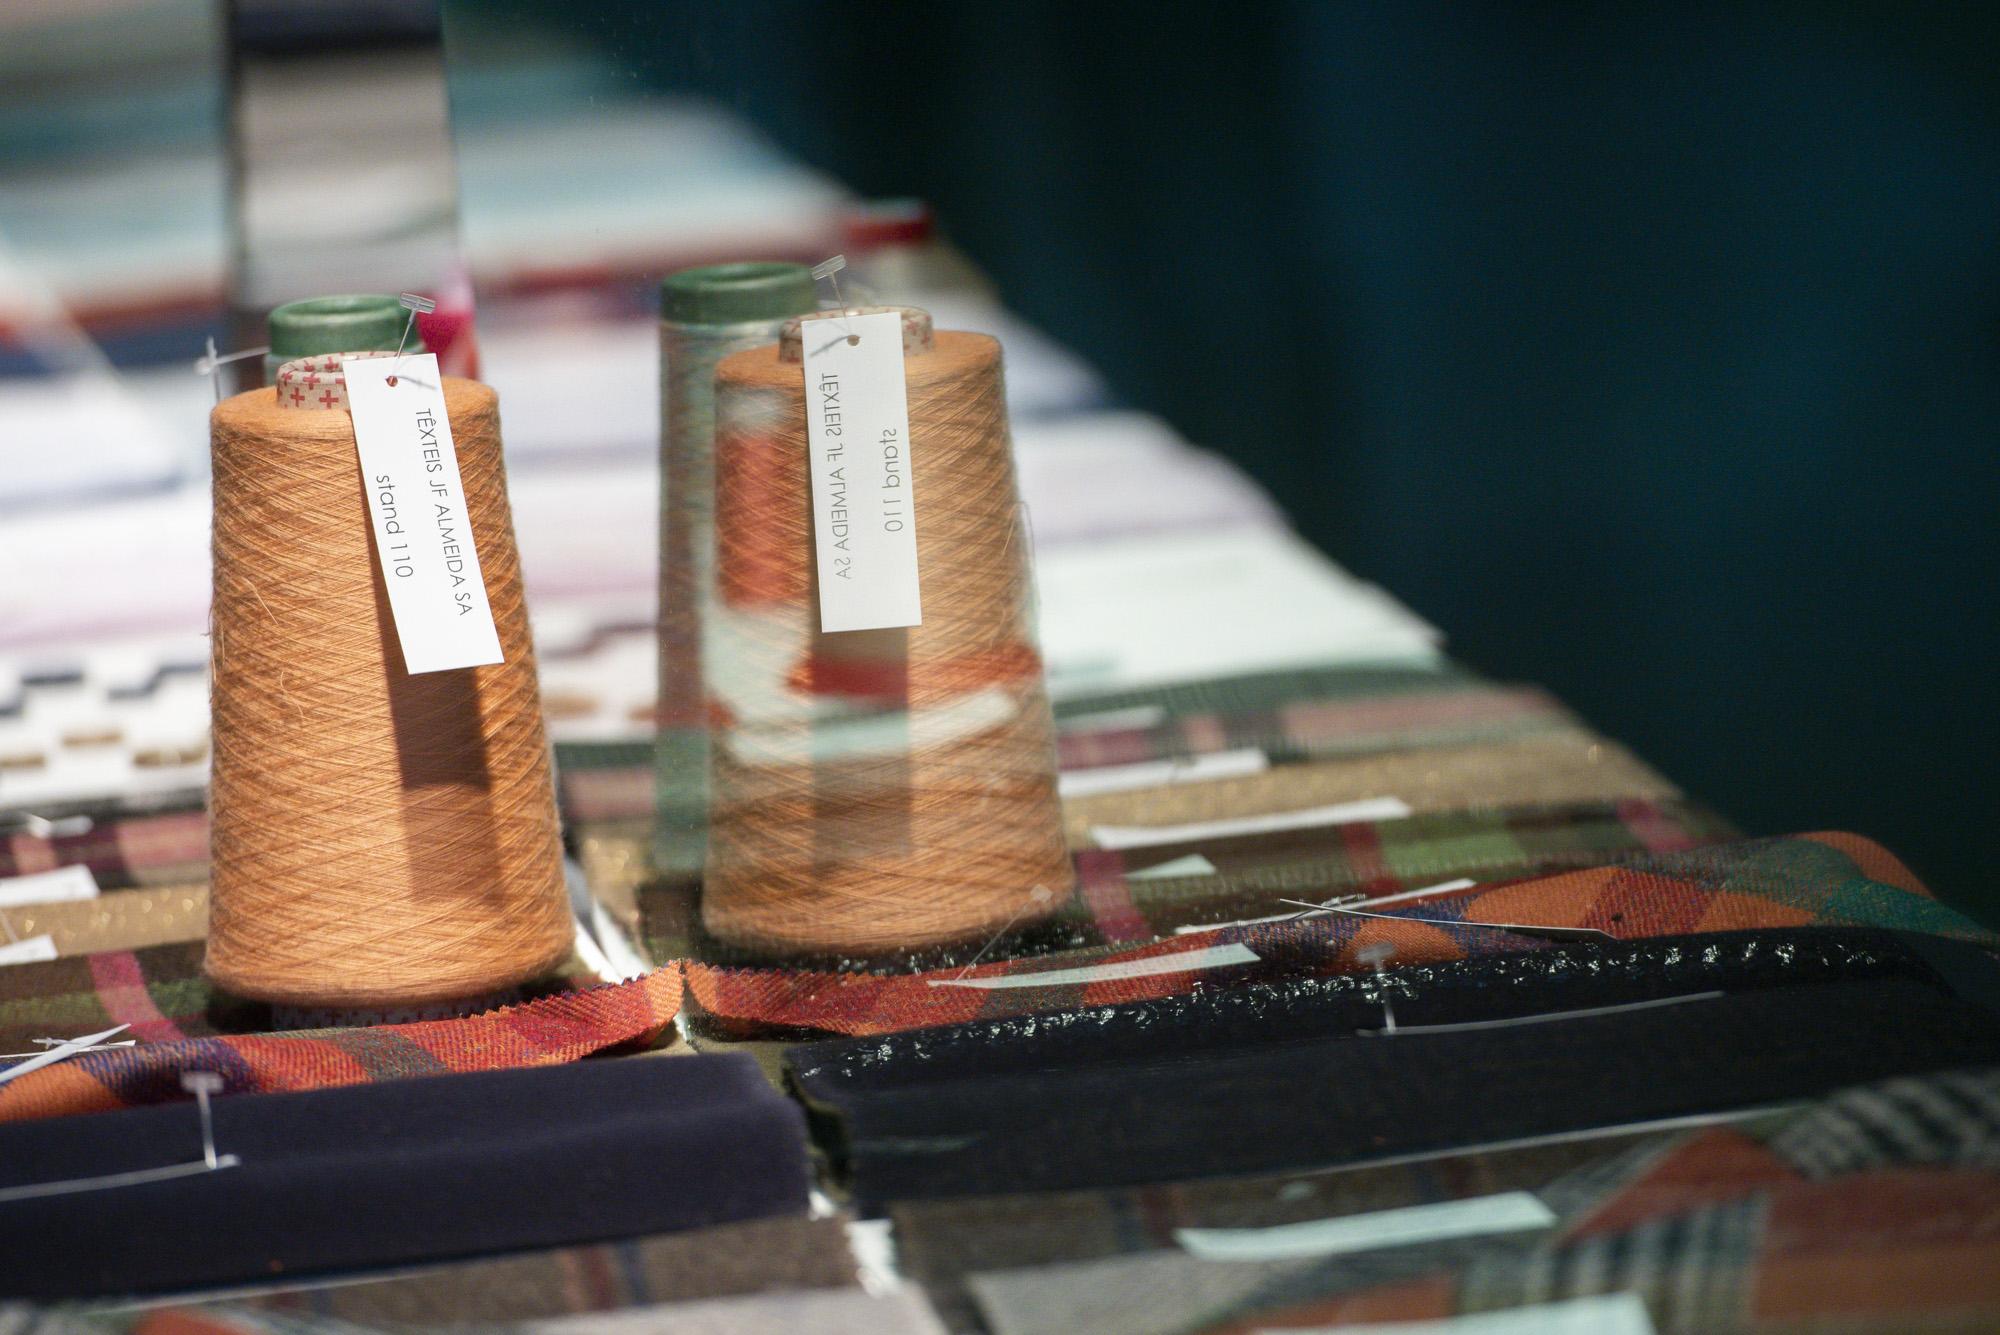 Feira têxtil MODtissimo, na Alfândega do Porto - 23SET20